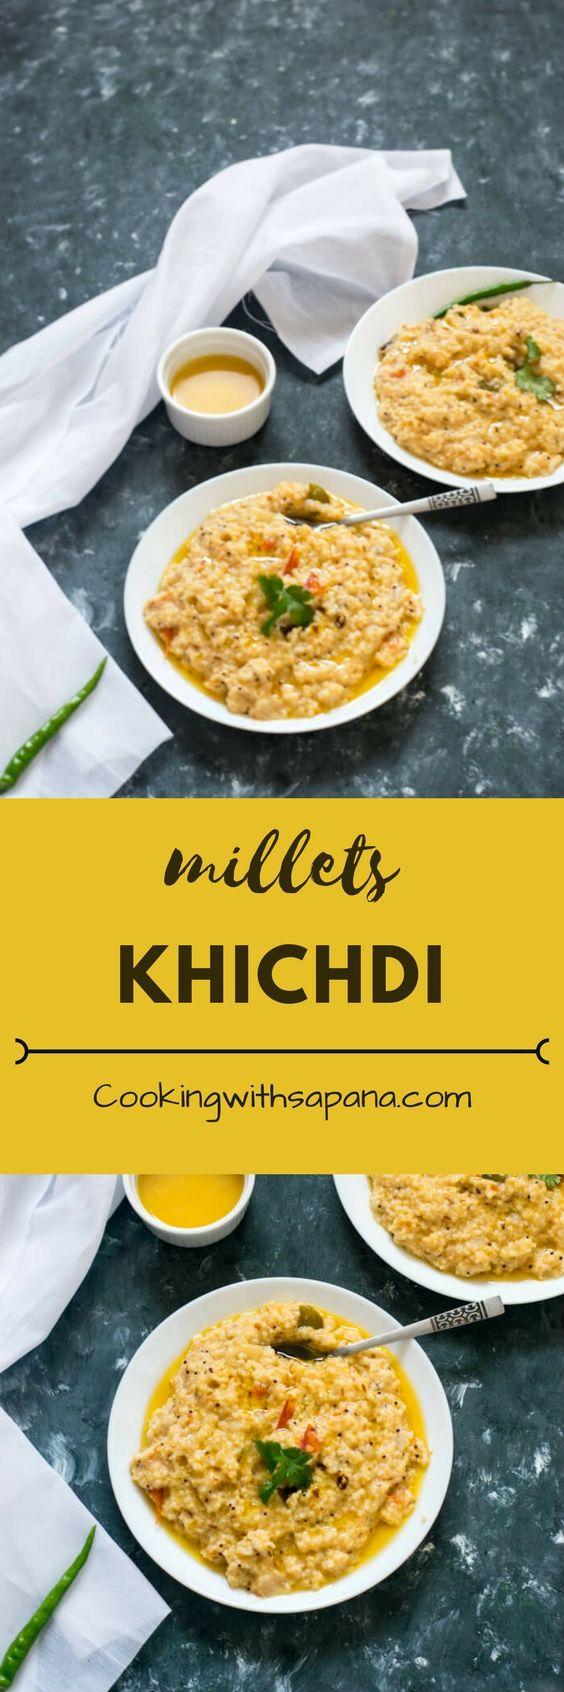 millets khichdi   kodo millet khichdi recipe   healthy millets khichdi